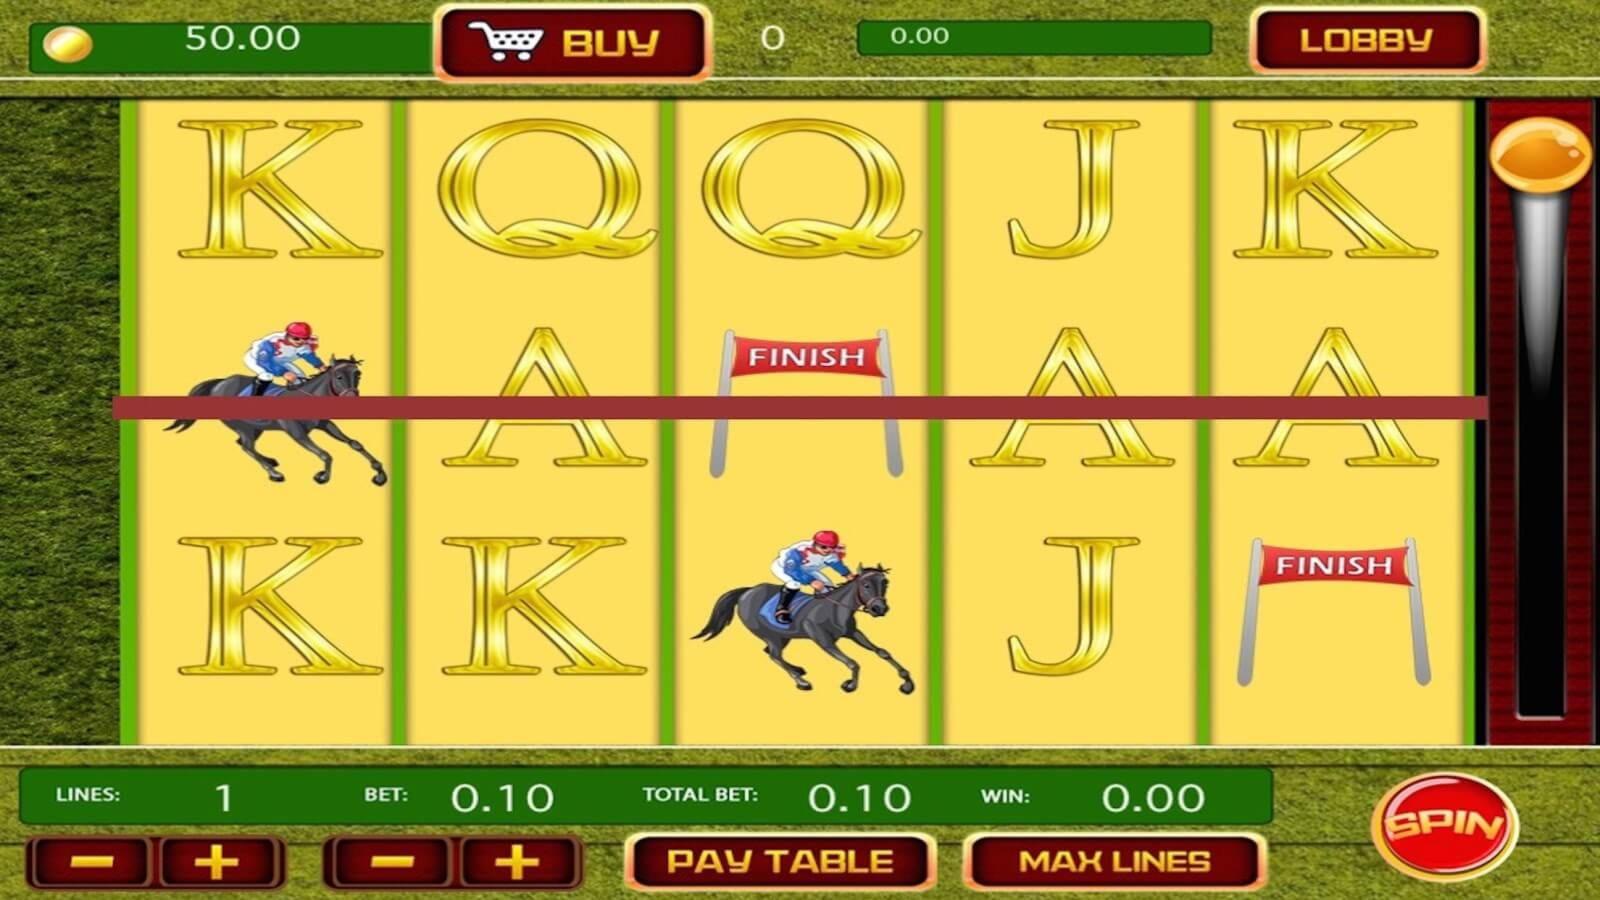 435% Box 24 казинодағы казинодағы кездесу